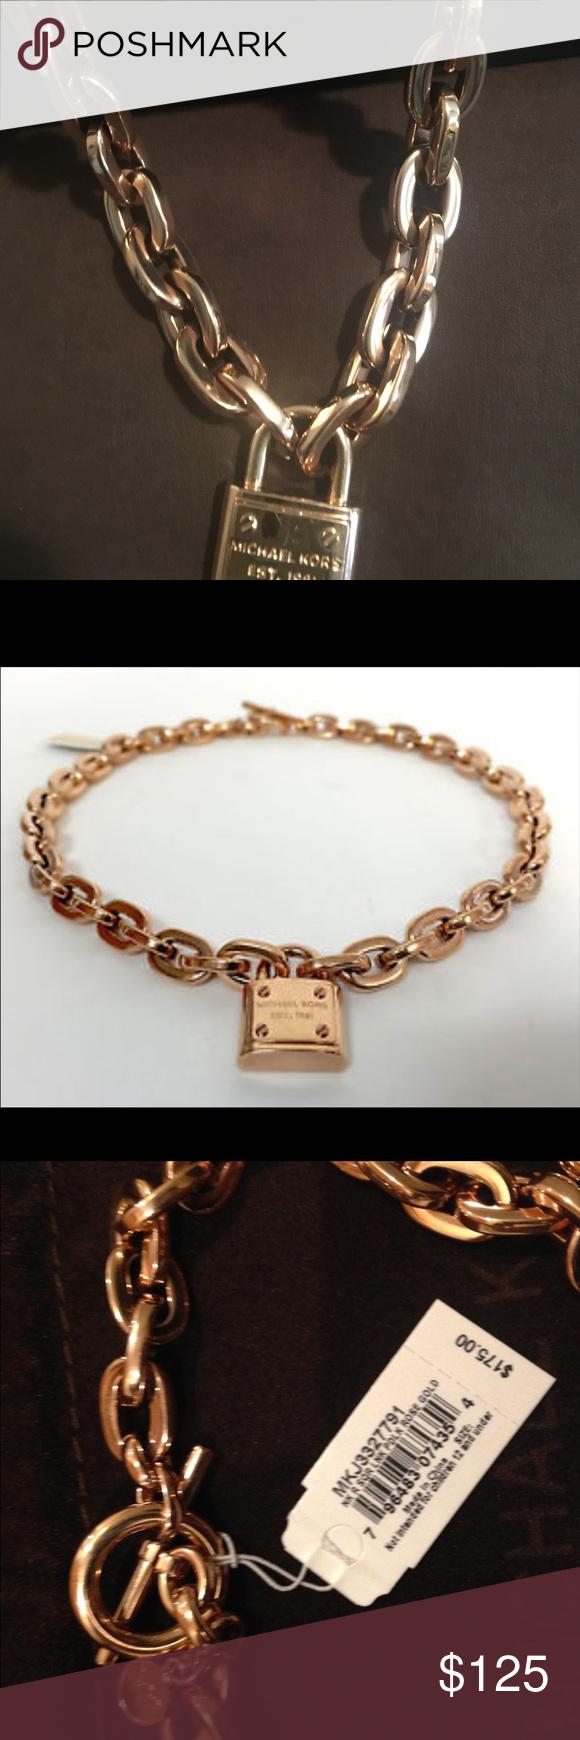 e4b4a598060f Beautiful MK ROSE GOLD NECKLACE❤ ❤ ❤ MKJ3327791 ROSE GOLD PADLOCK NECKLACE